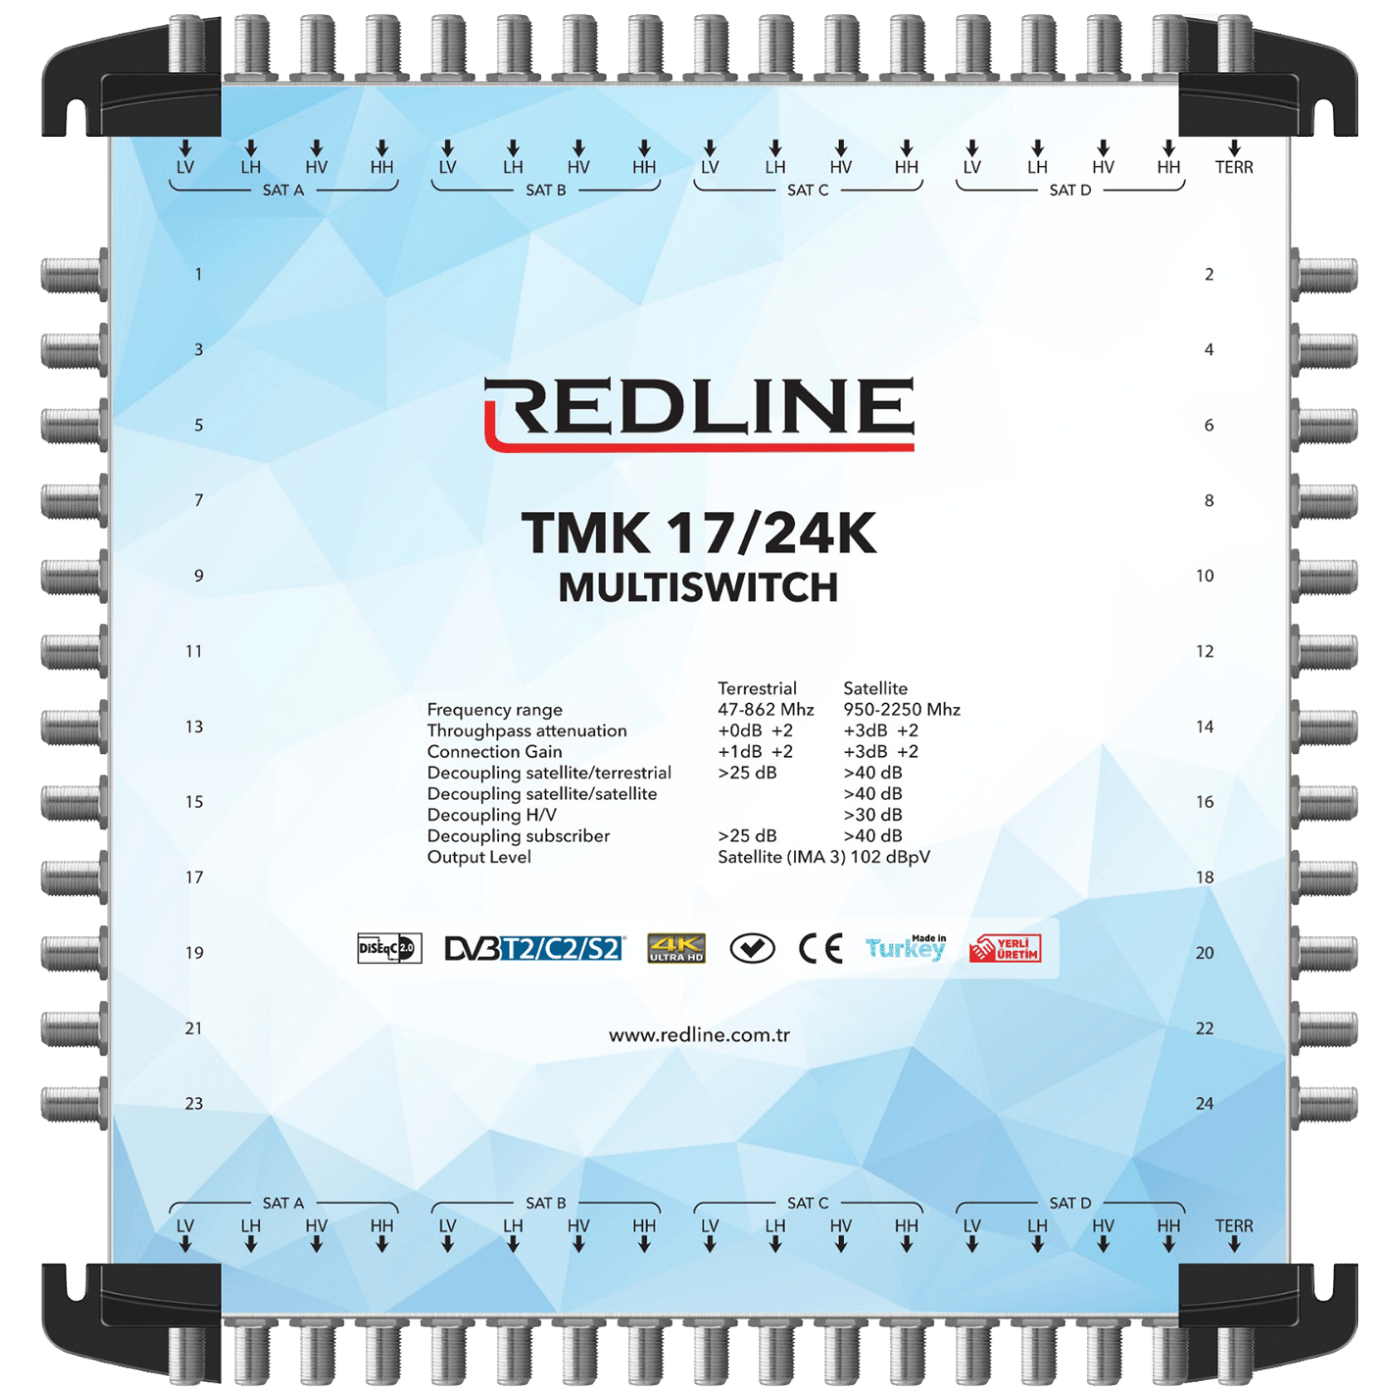 REDLINE - TMK 17/24K